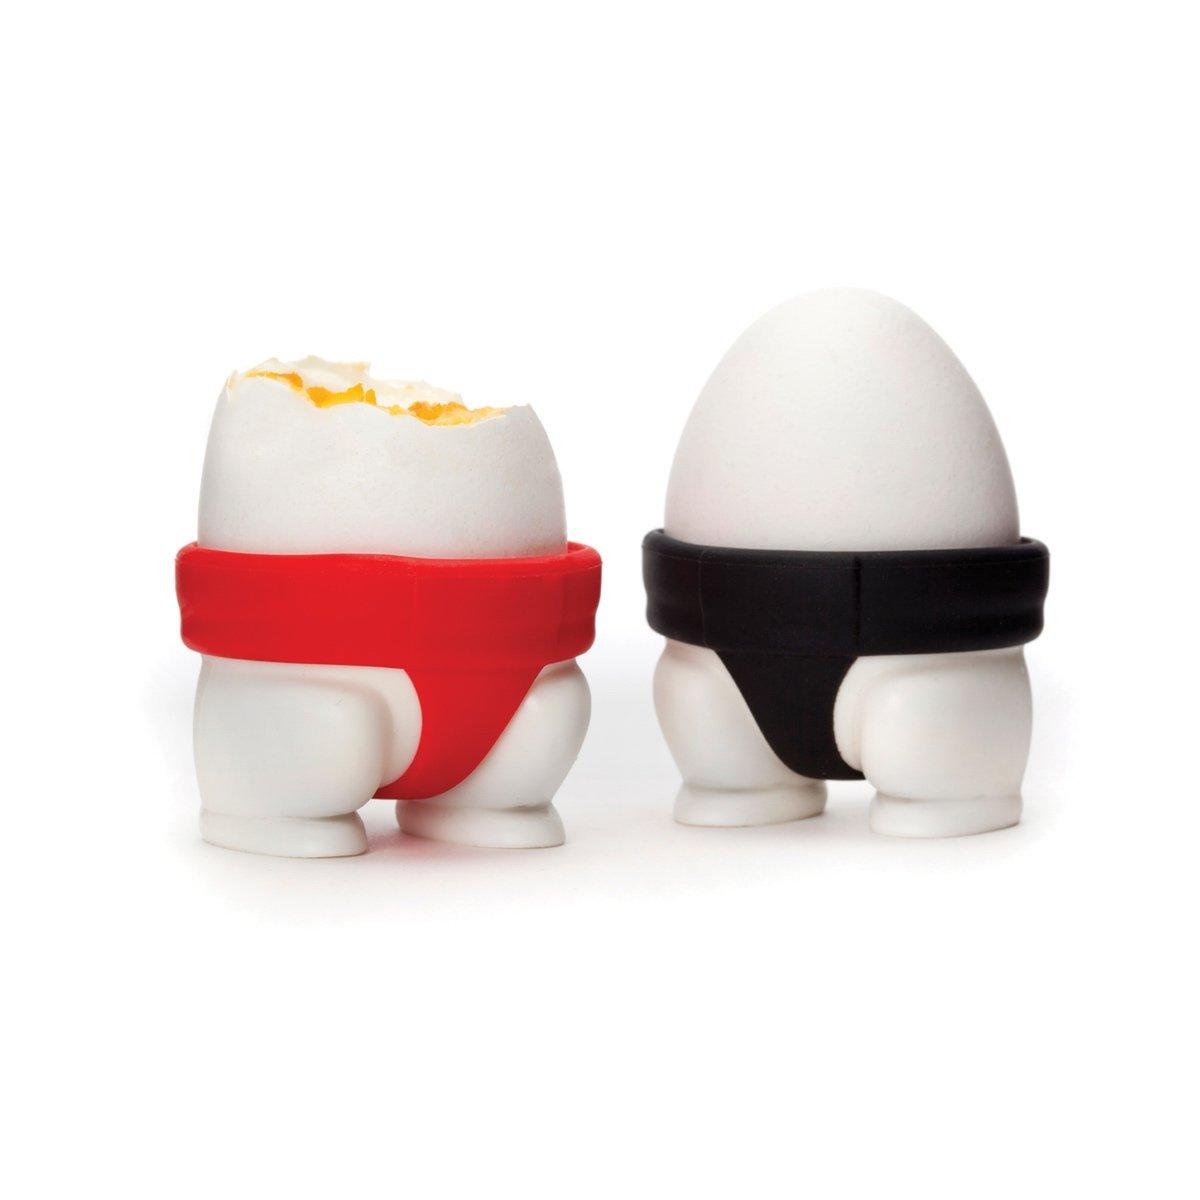 egg gadget 1